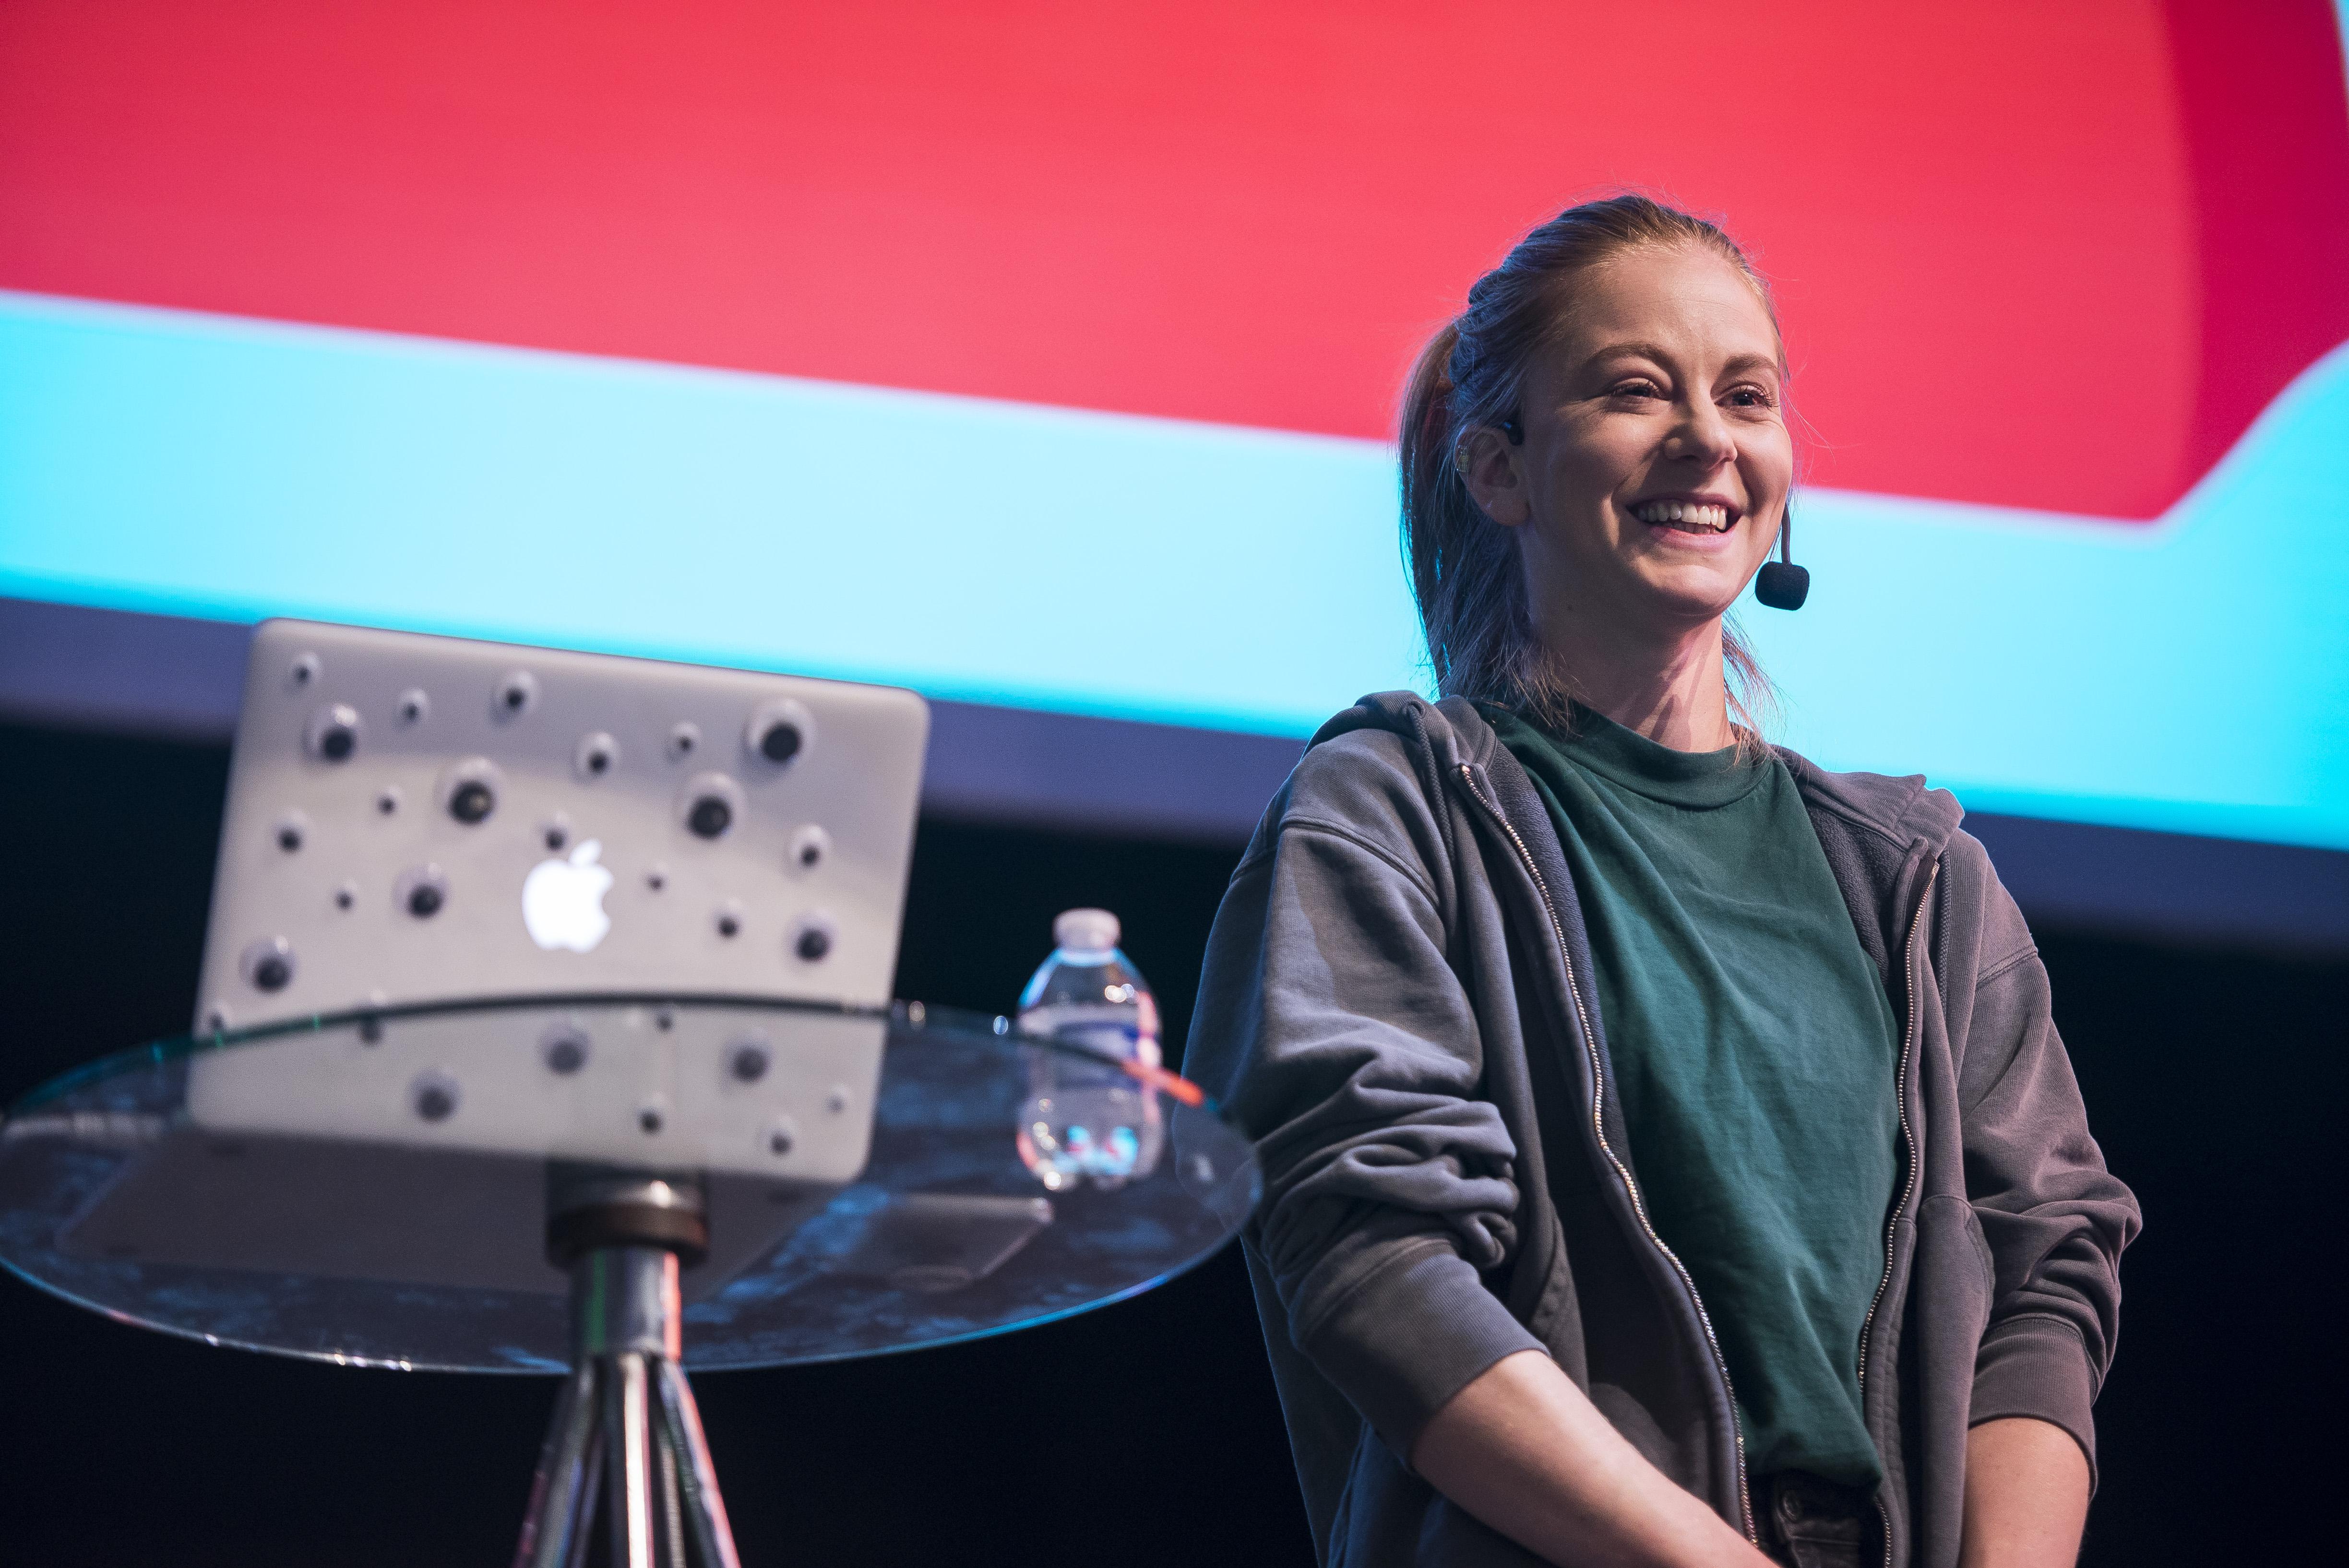 Simone Giertz